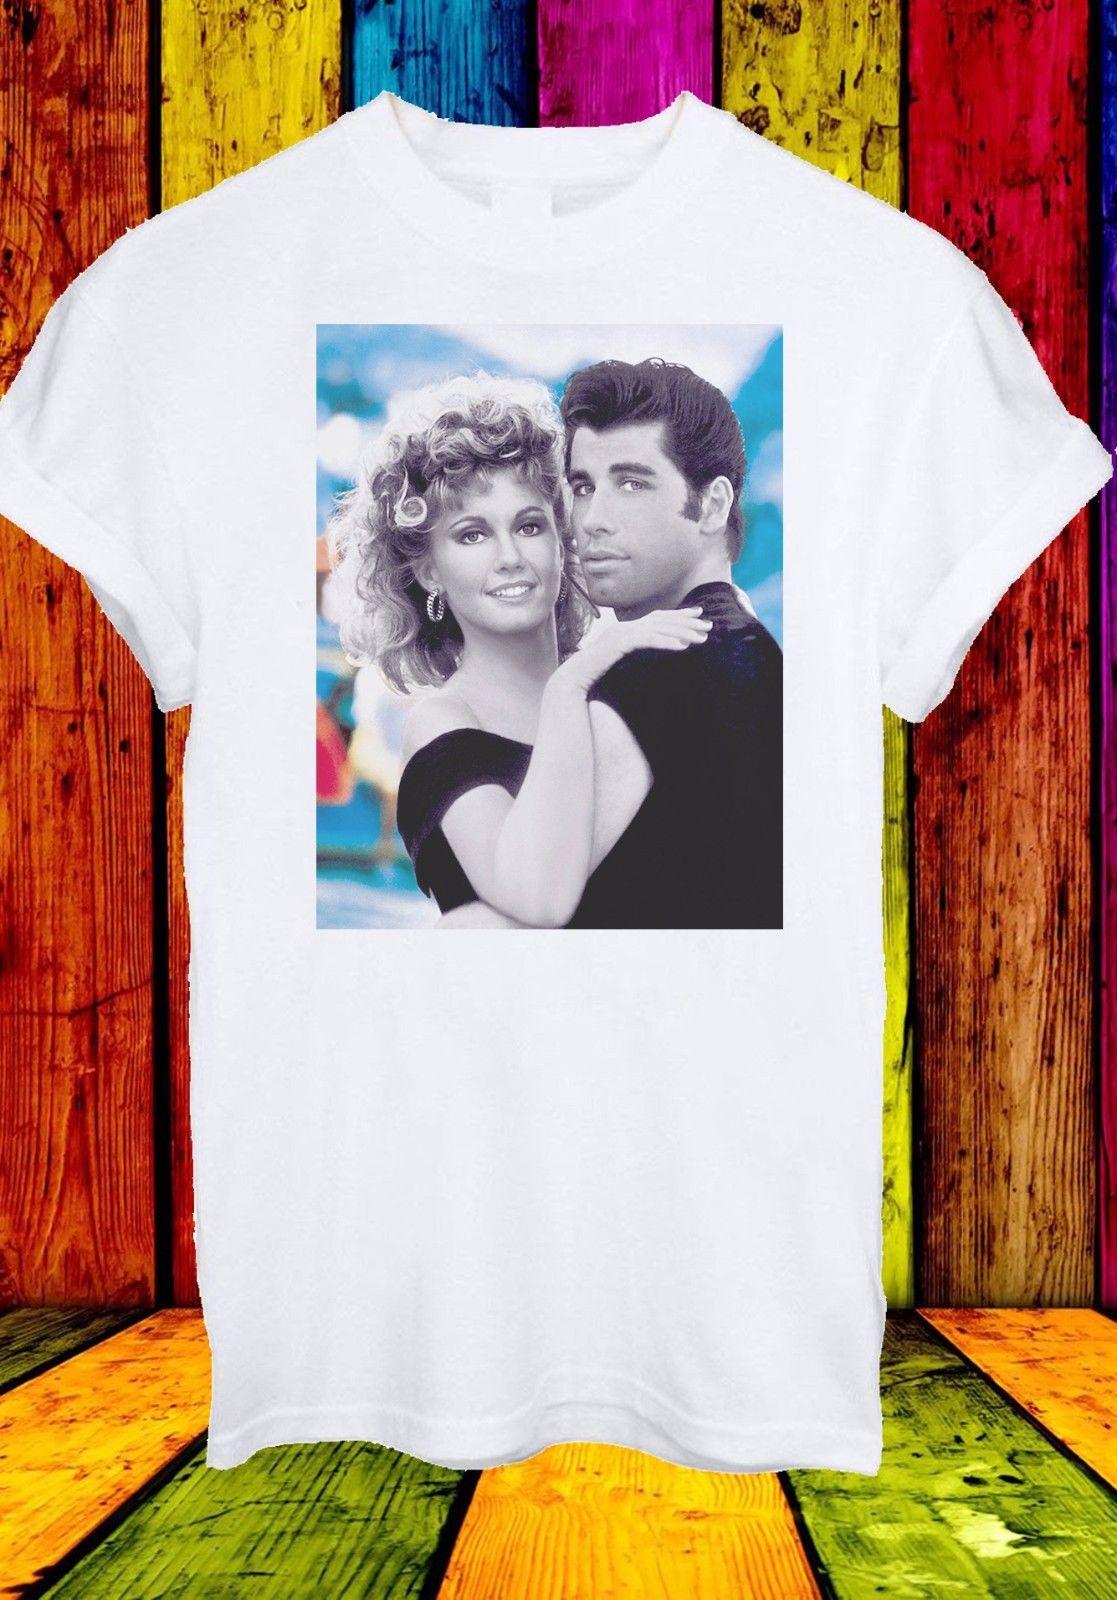 Gildan John Travolta and Olivia Newton-John Grease Movie Men Women Unisex T-shirt 230